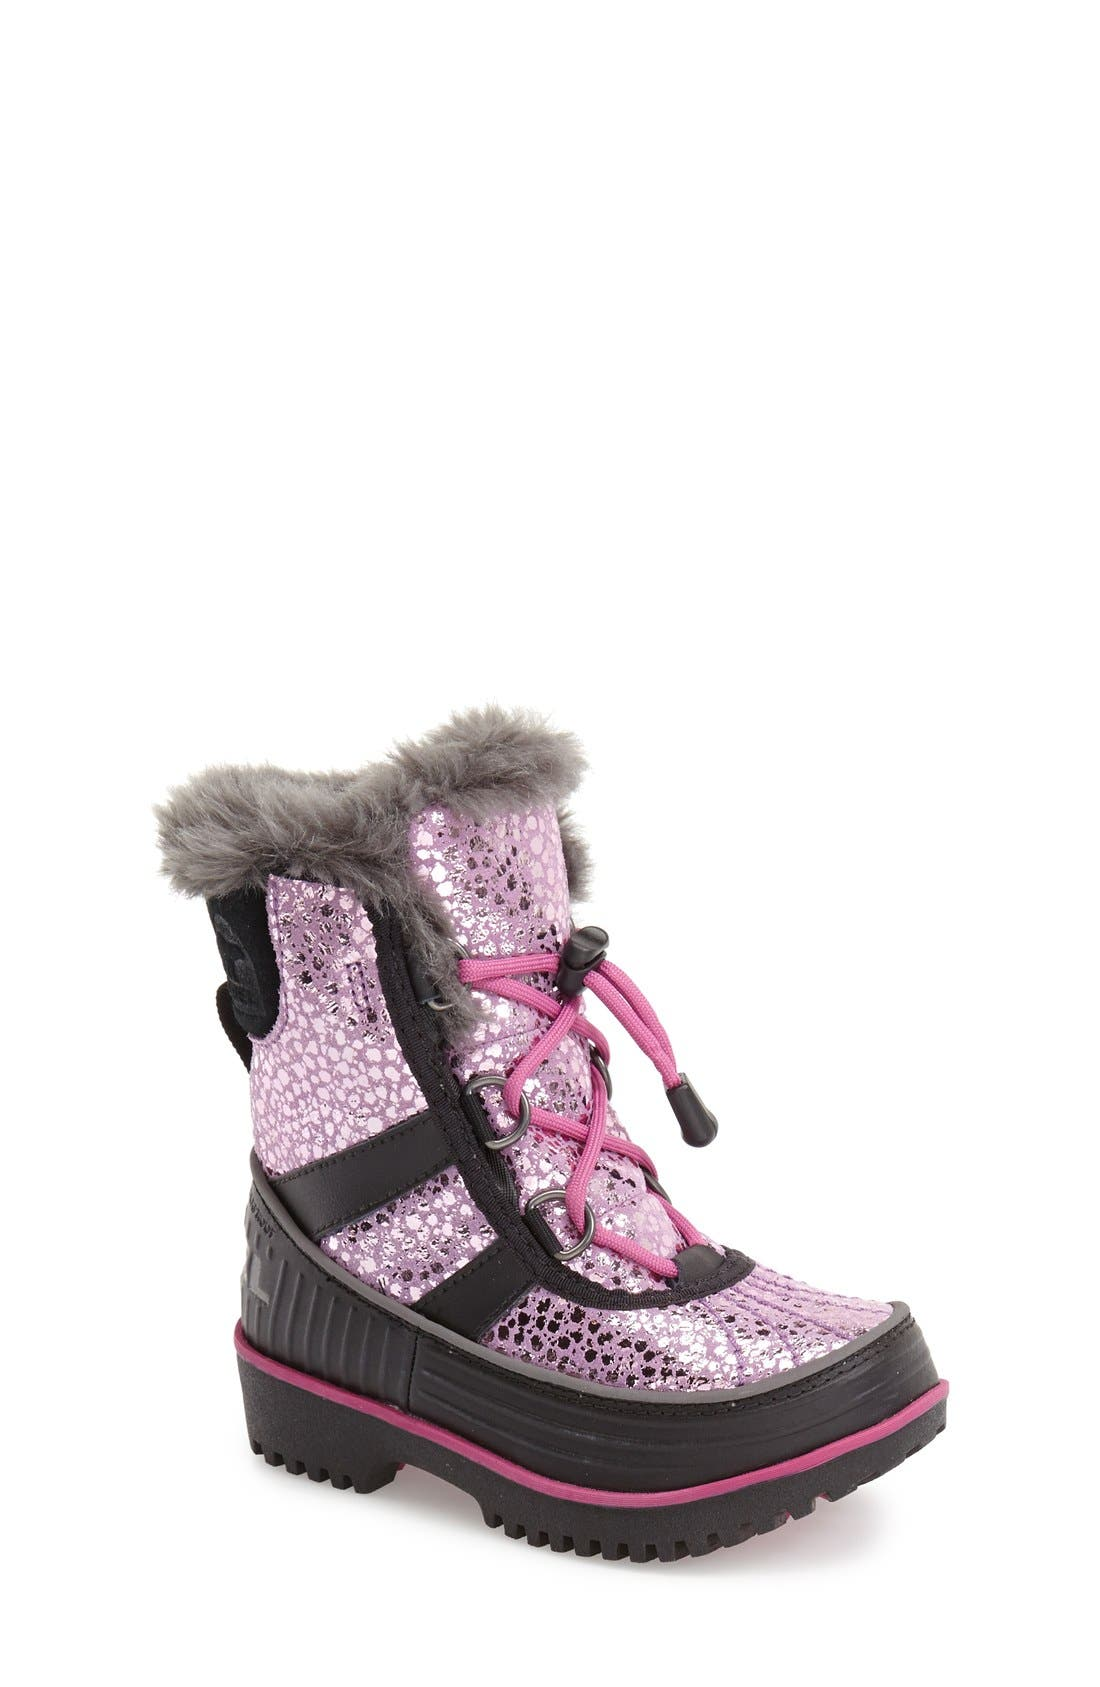 Main Image - SOREL 'Tivoli II' Waterproof Snow Boot (Toddler & Little Kid)